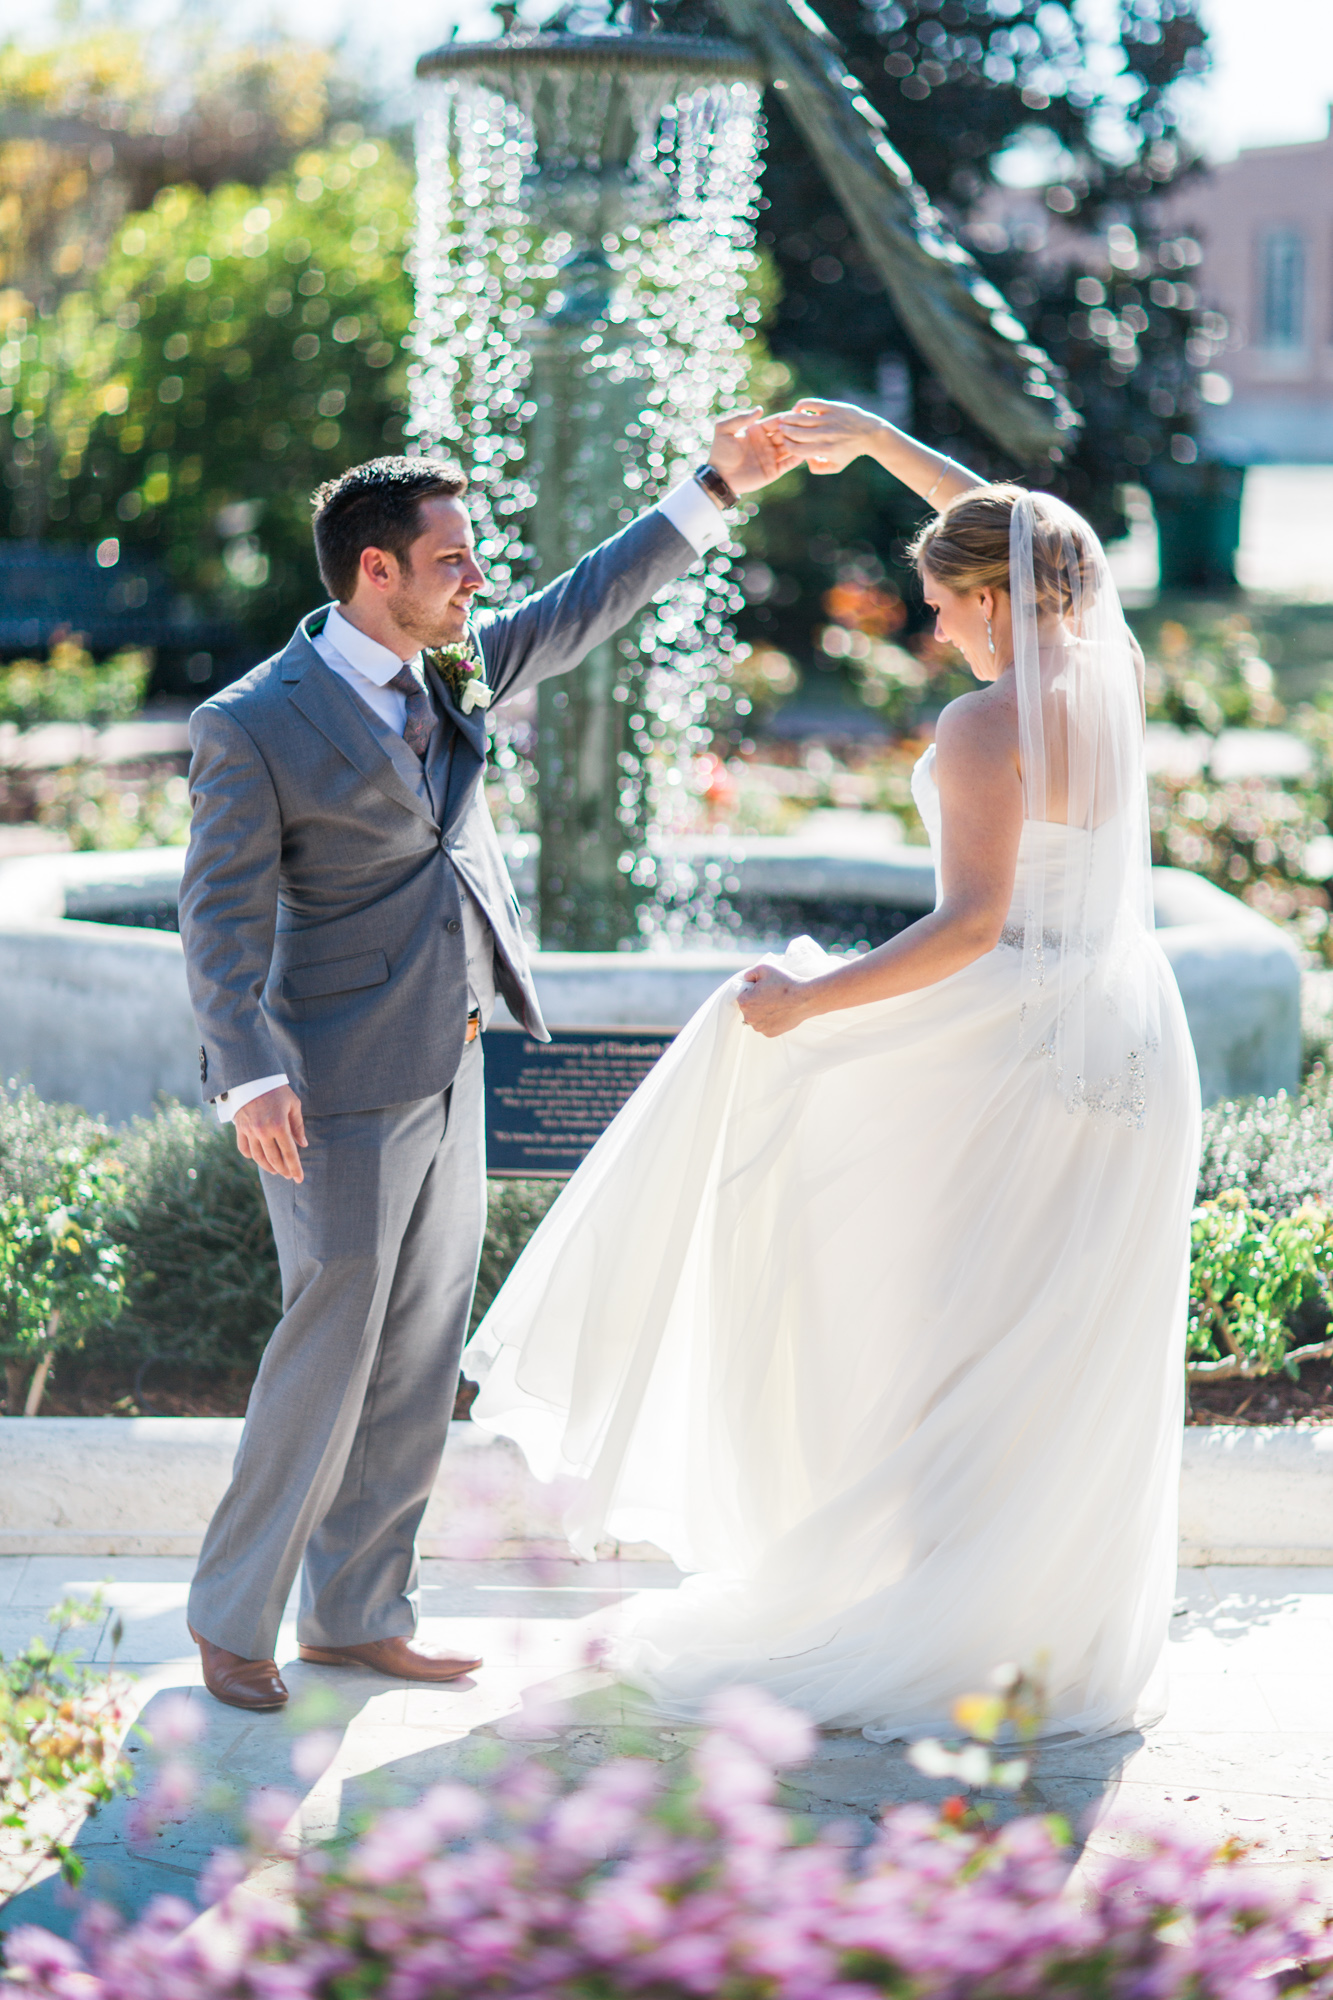 Winter Park Farmer's Market Wedding- Michael & Megan Fine Art Wedding Purple echeveria eucalyptus rose florals5.jpg